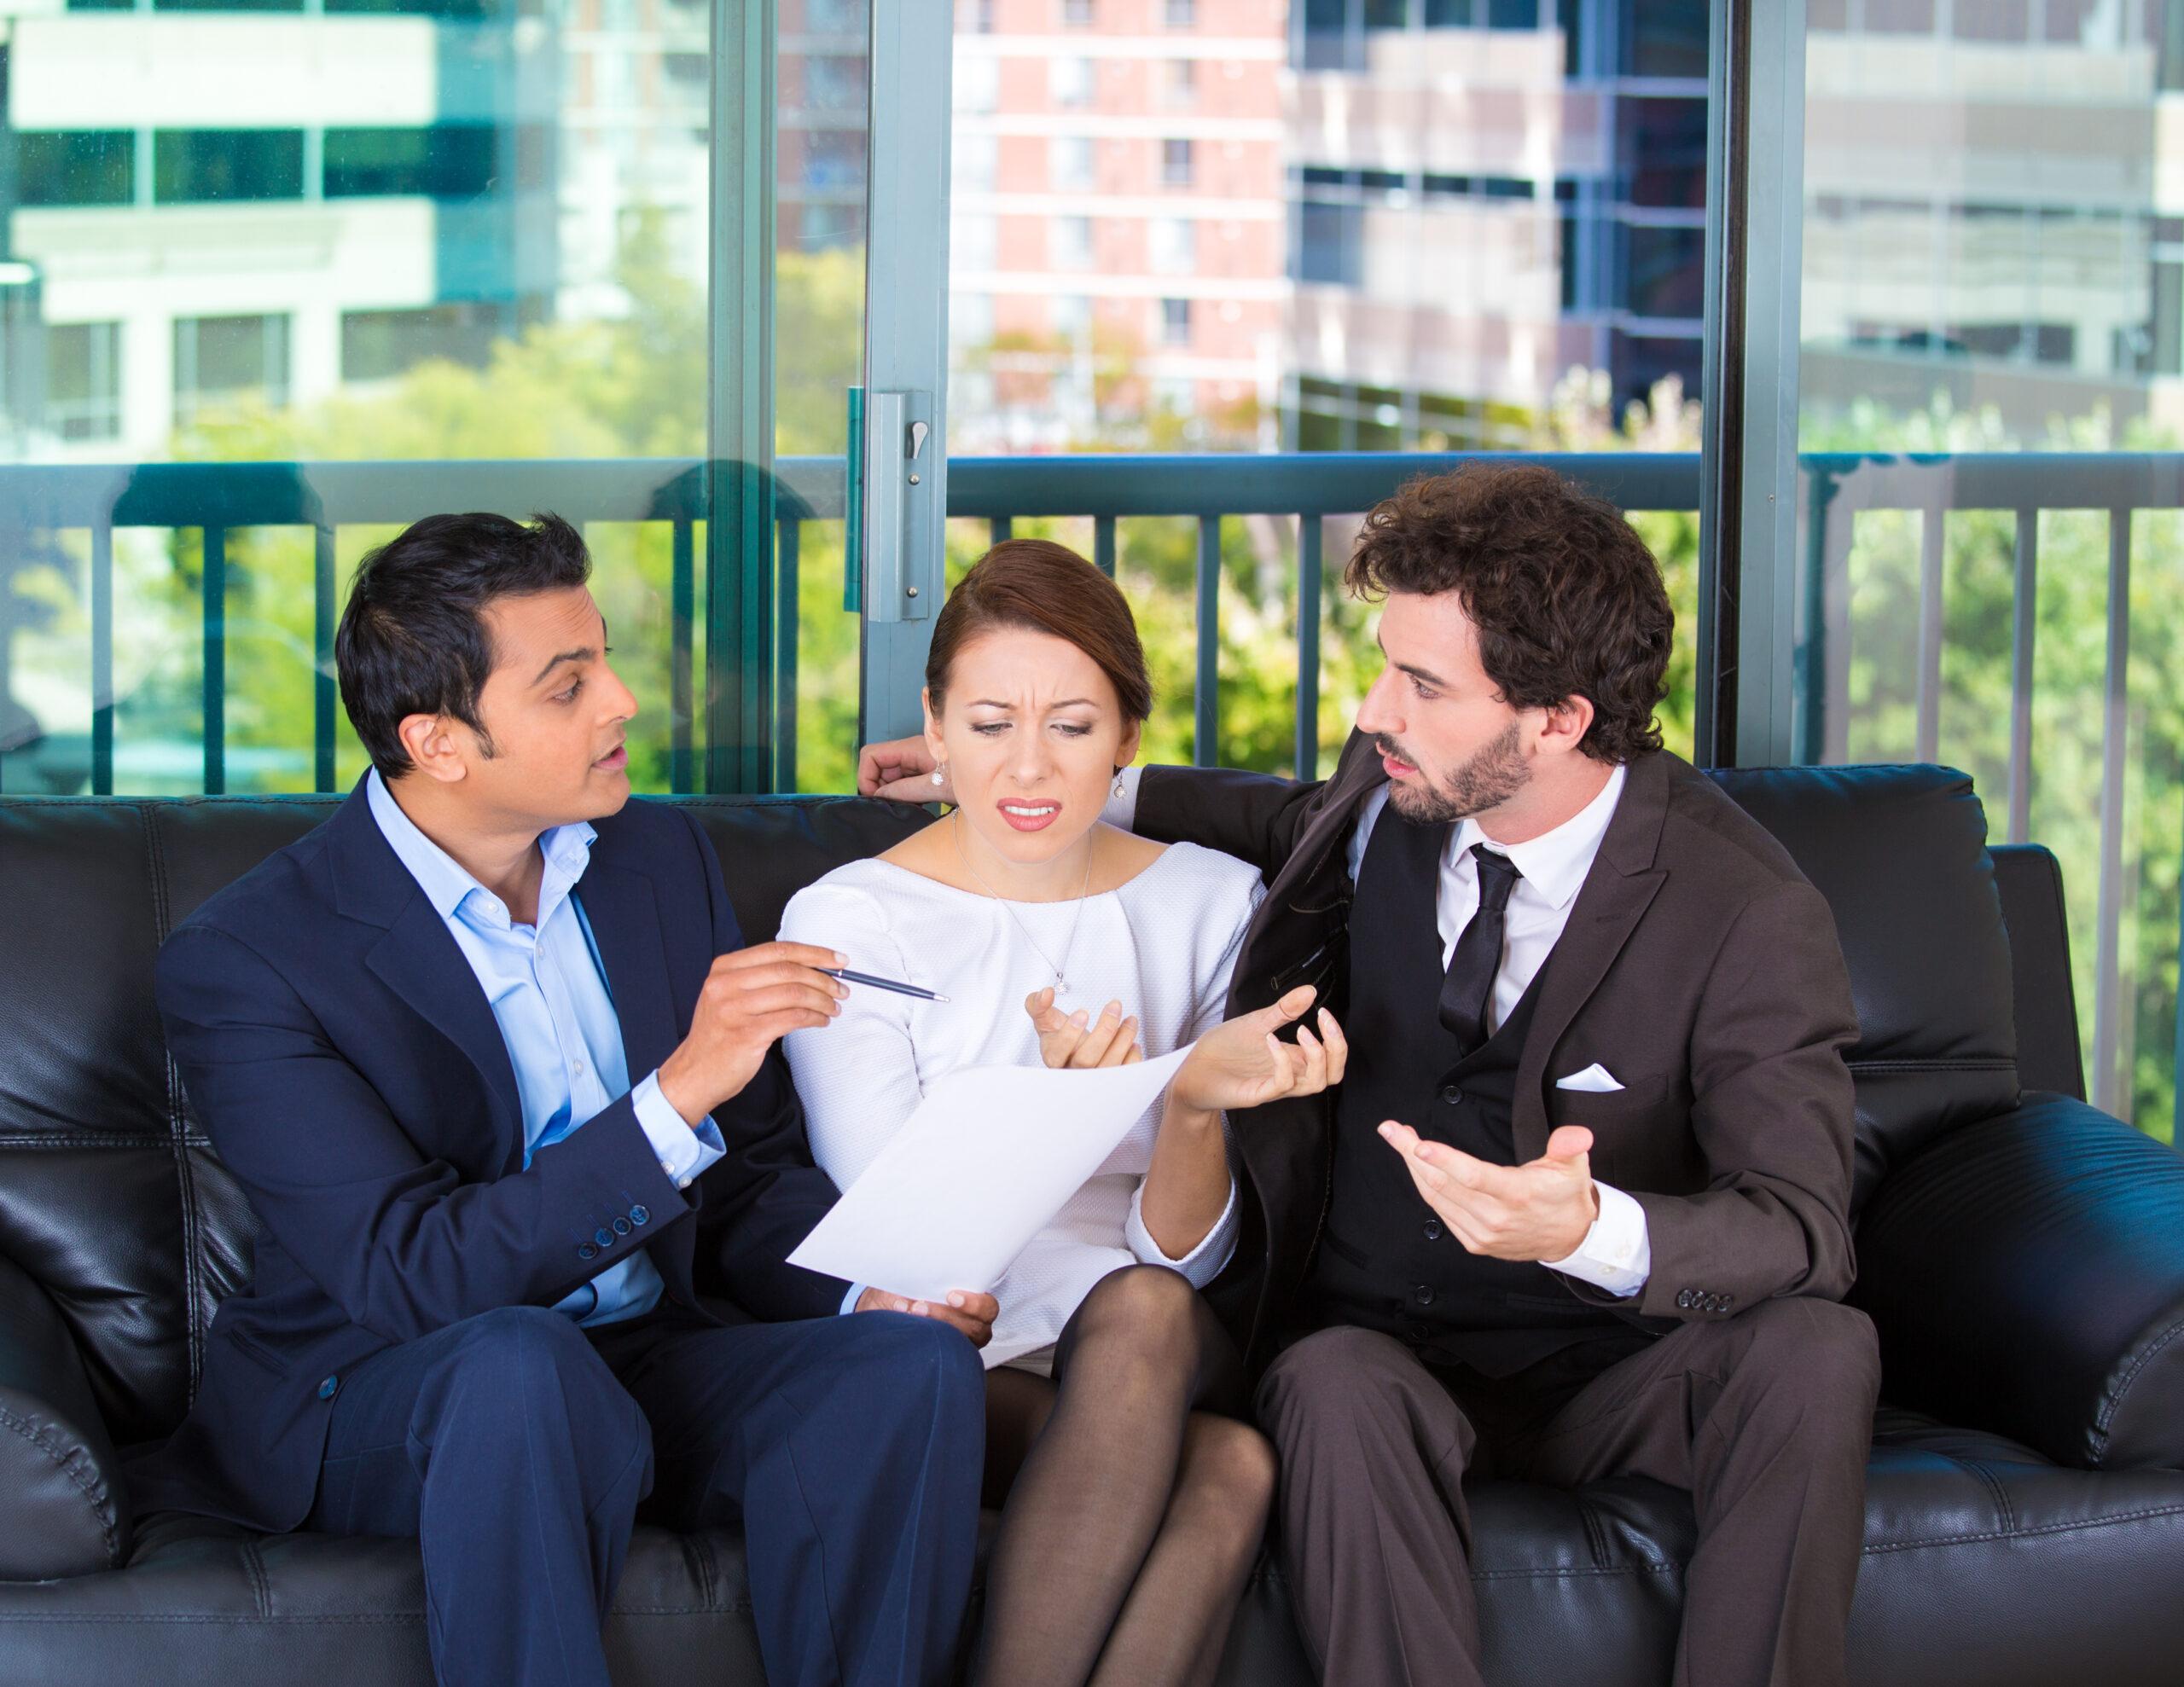 Woman Ignoring Business Men's Advice